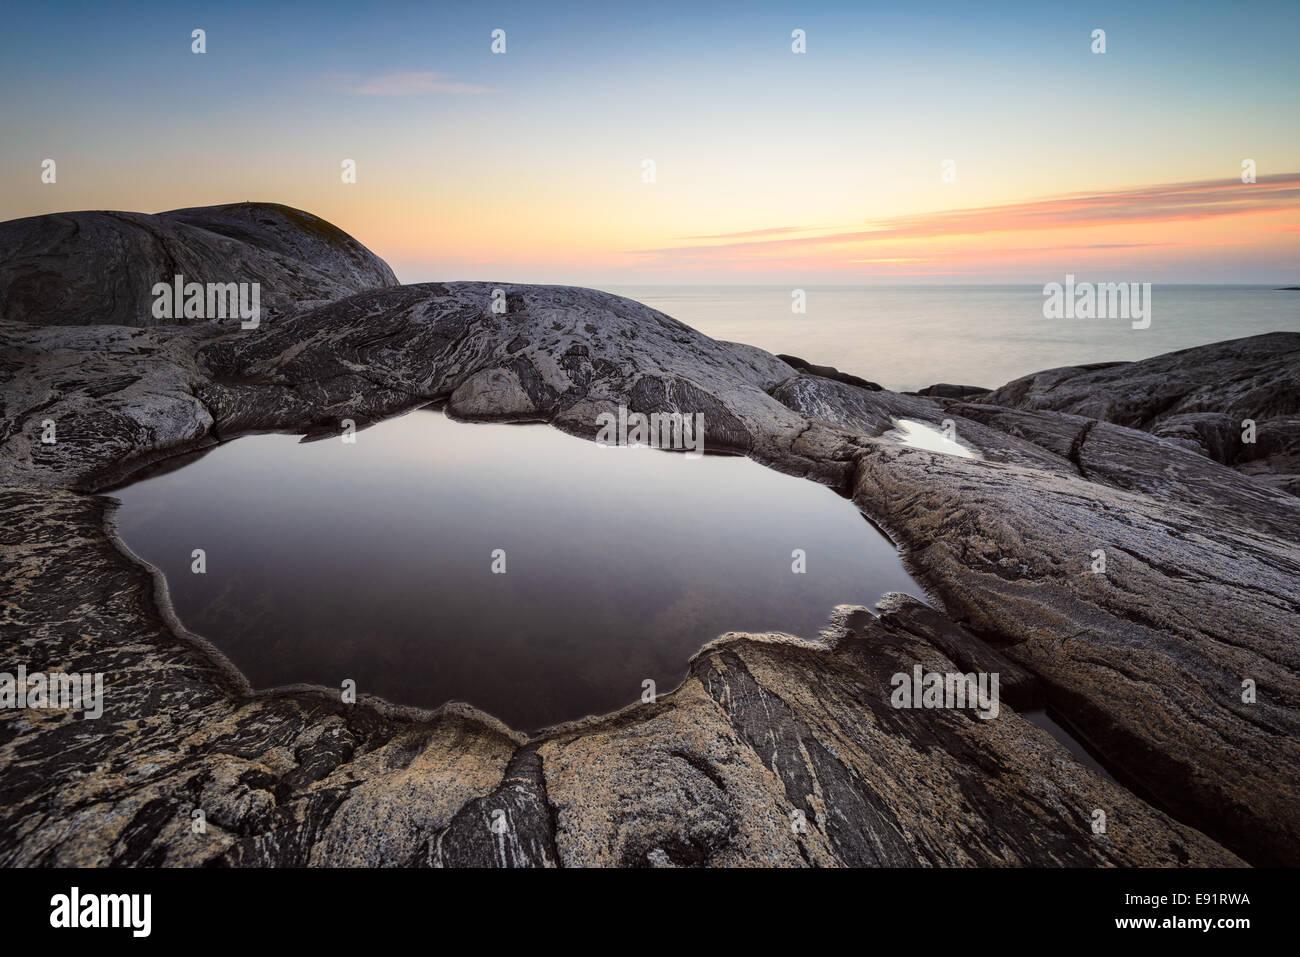 Marea suave piscina rodeada por rock al atardecer Imagen De Stock